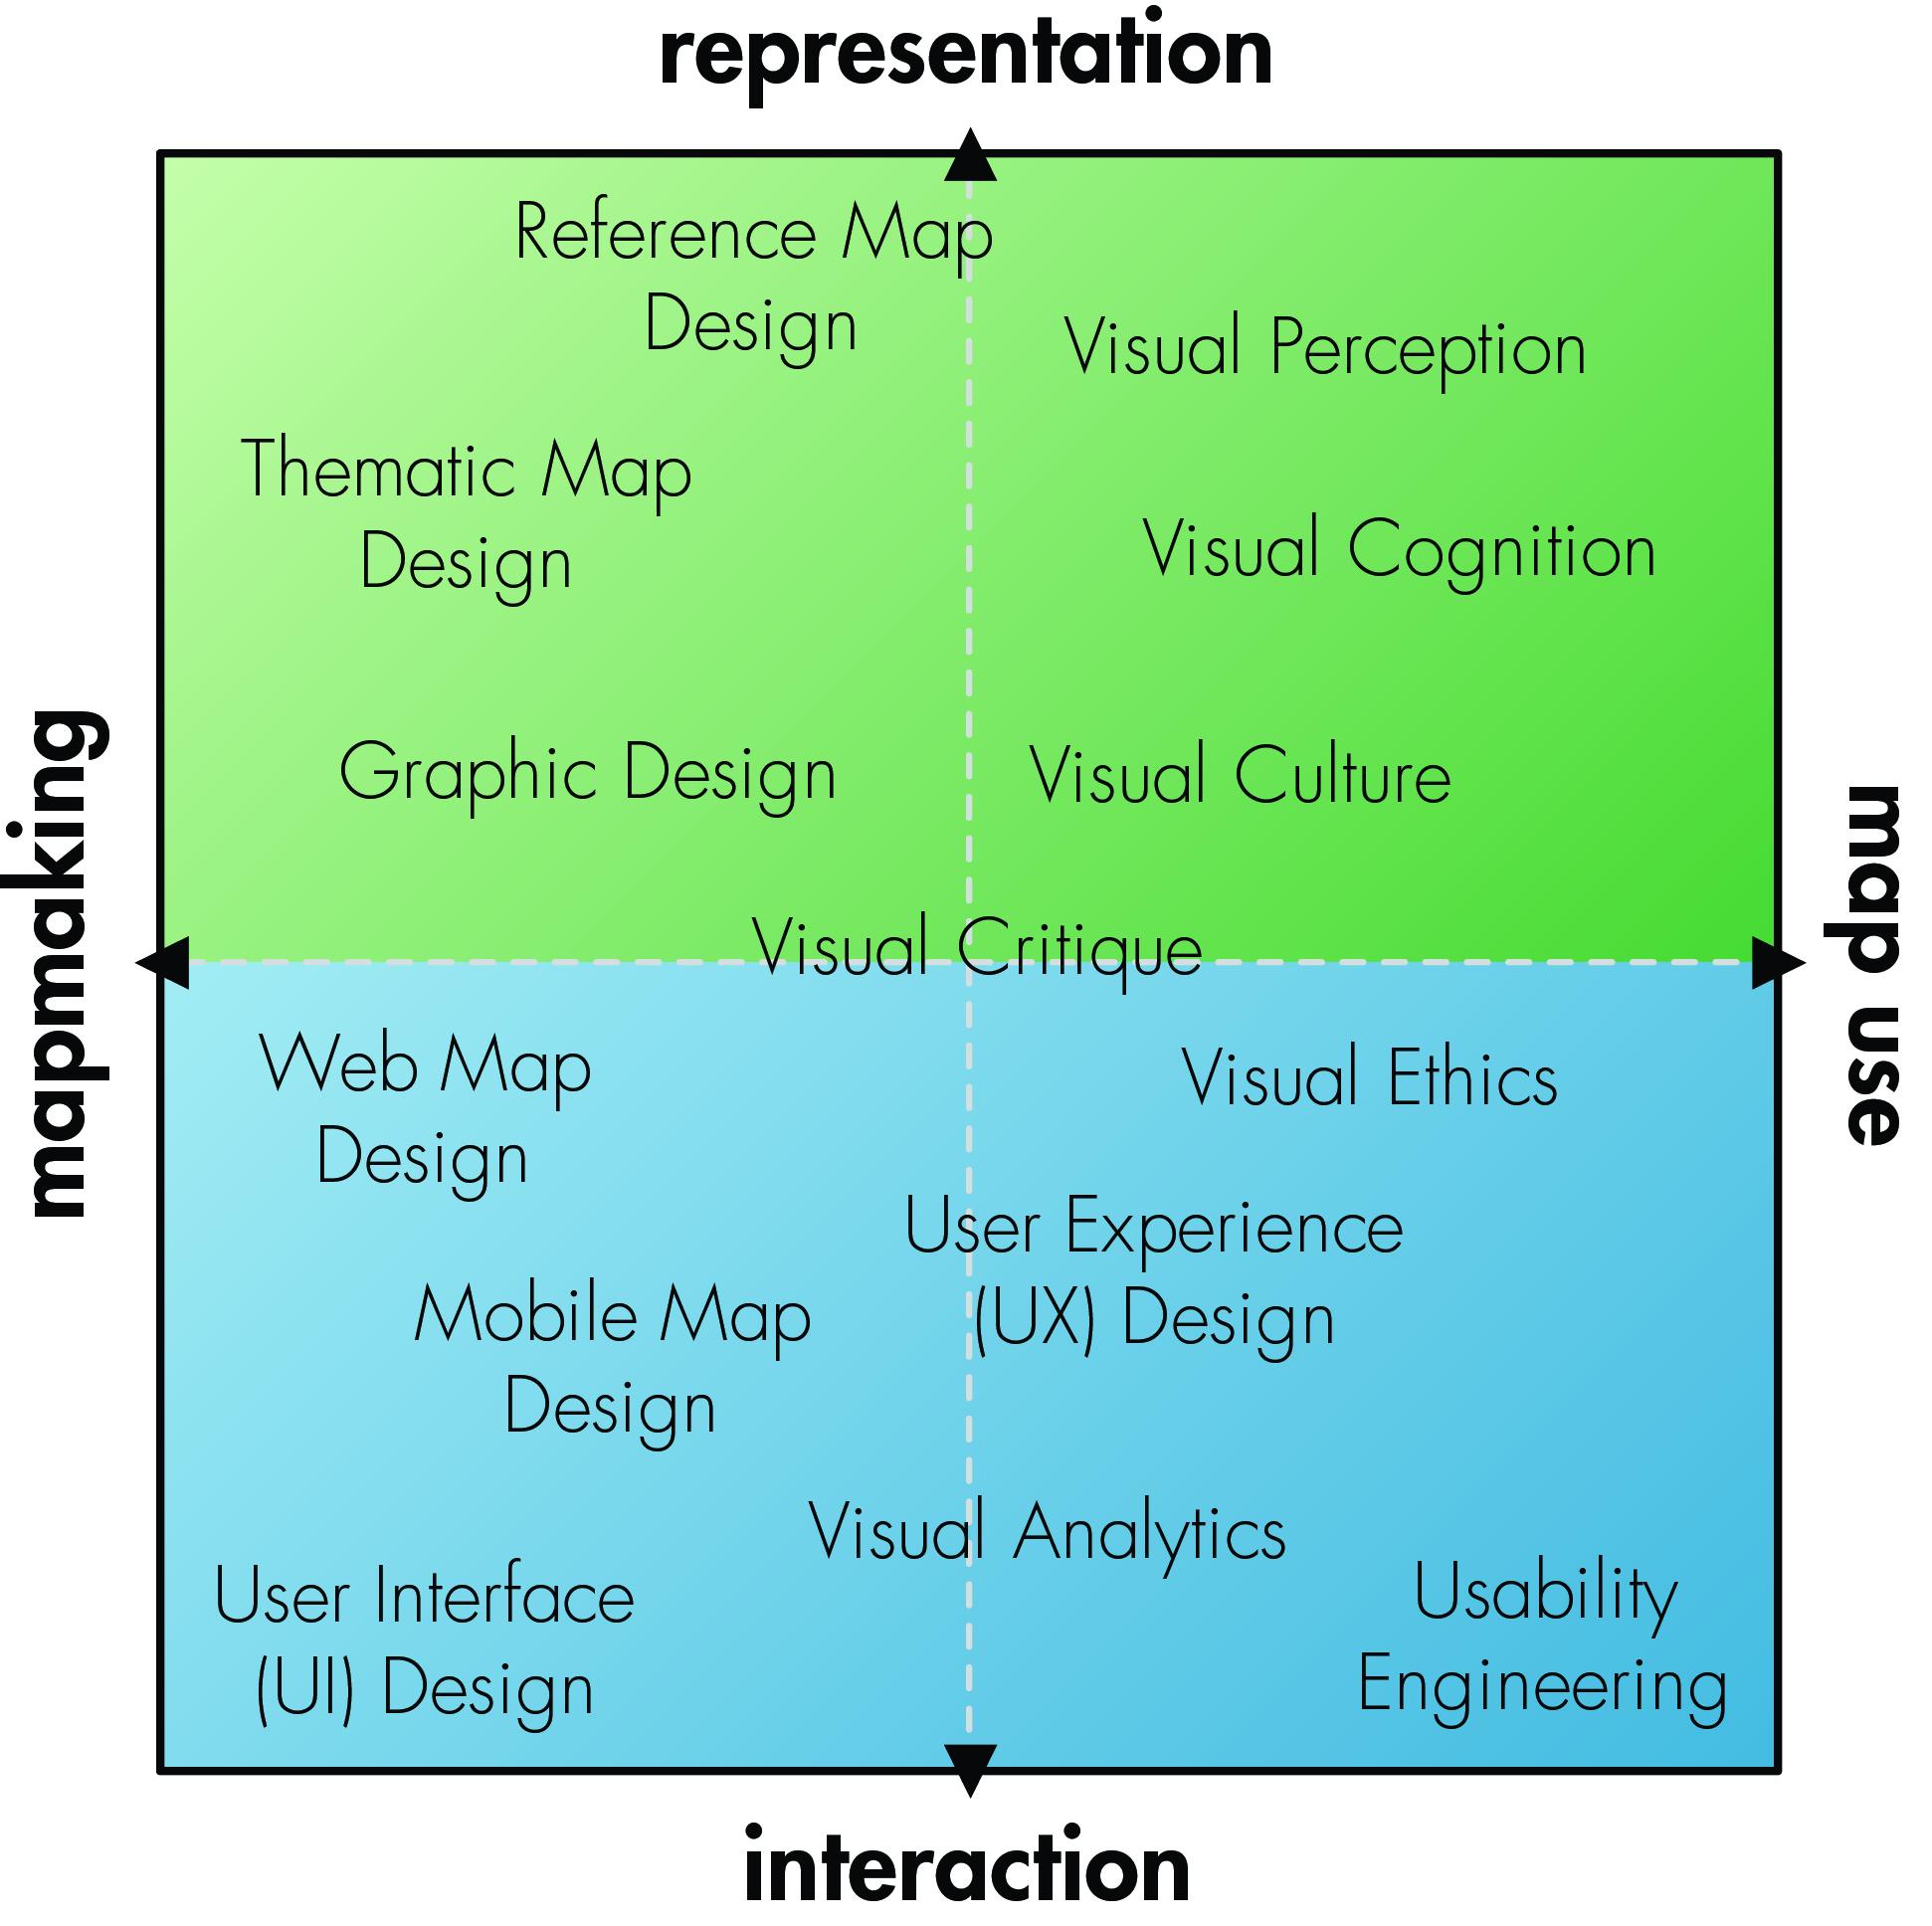 Representation vs. Interaction